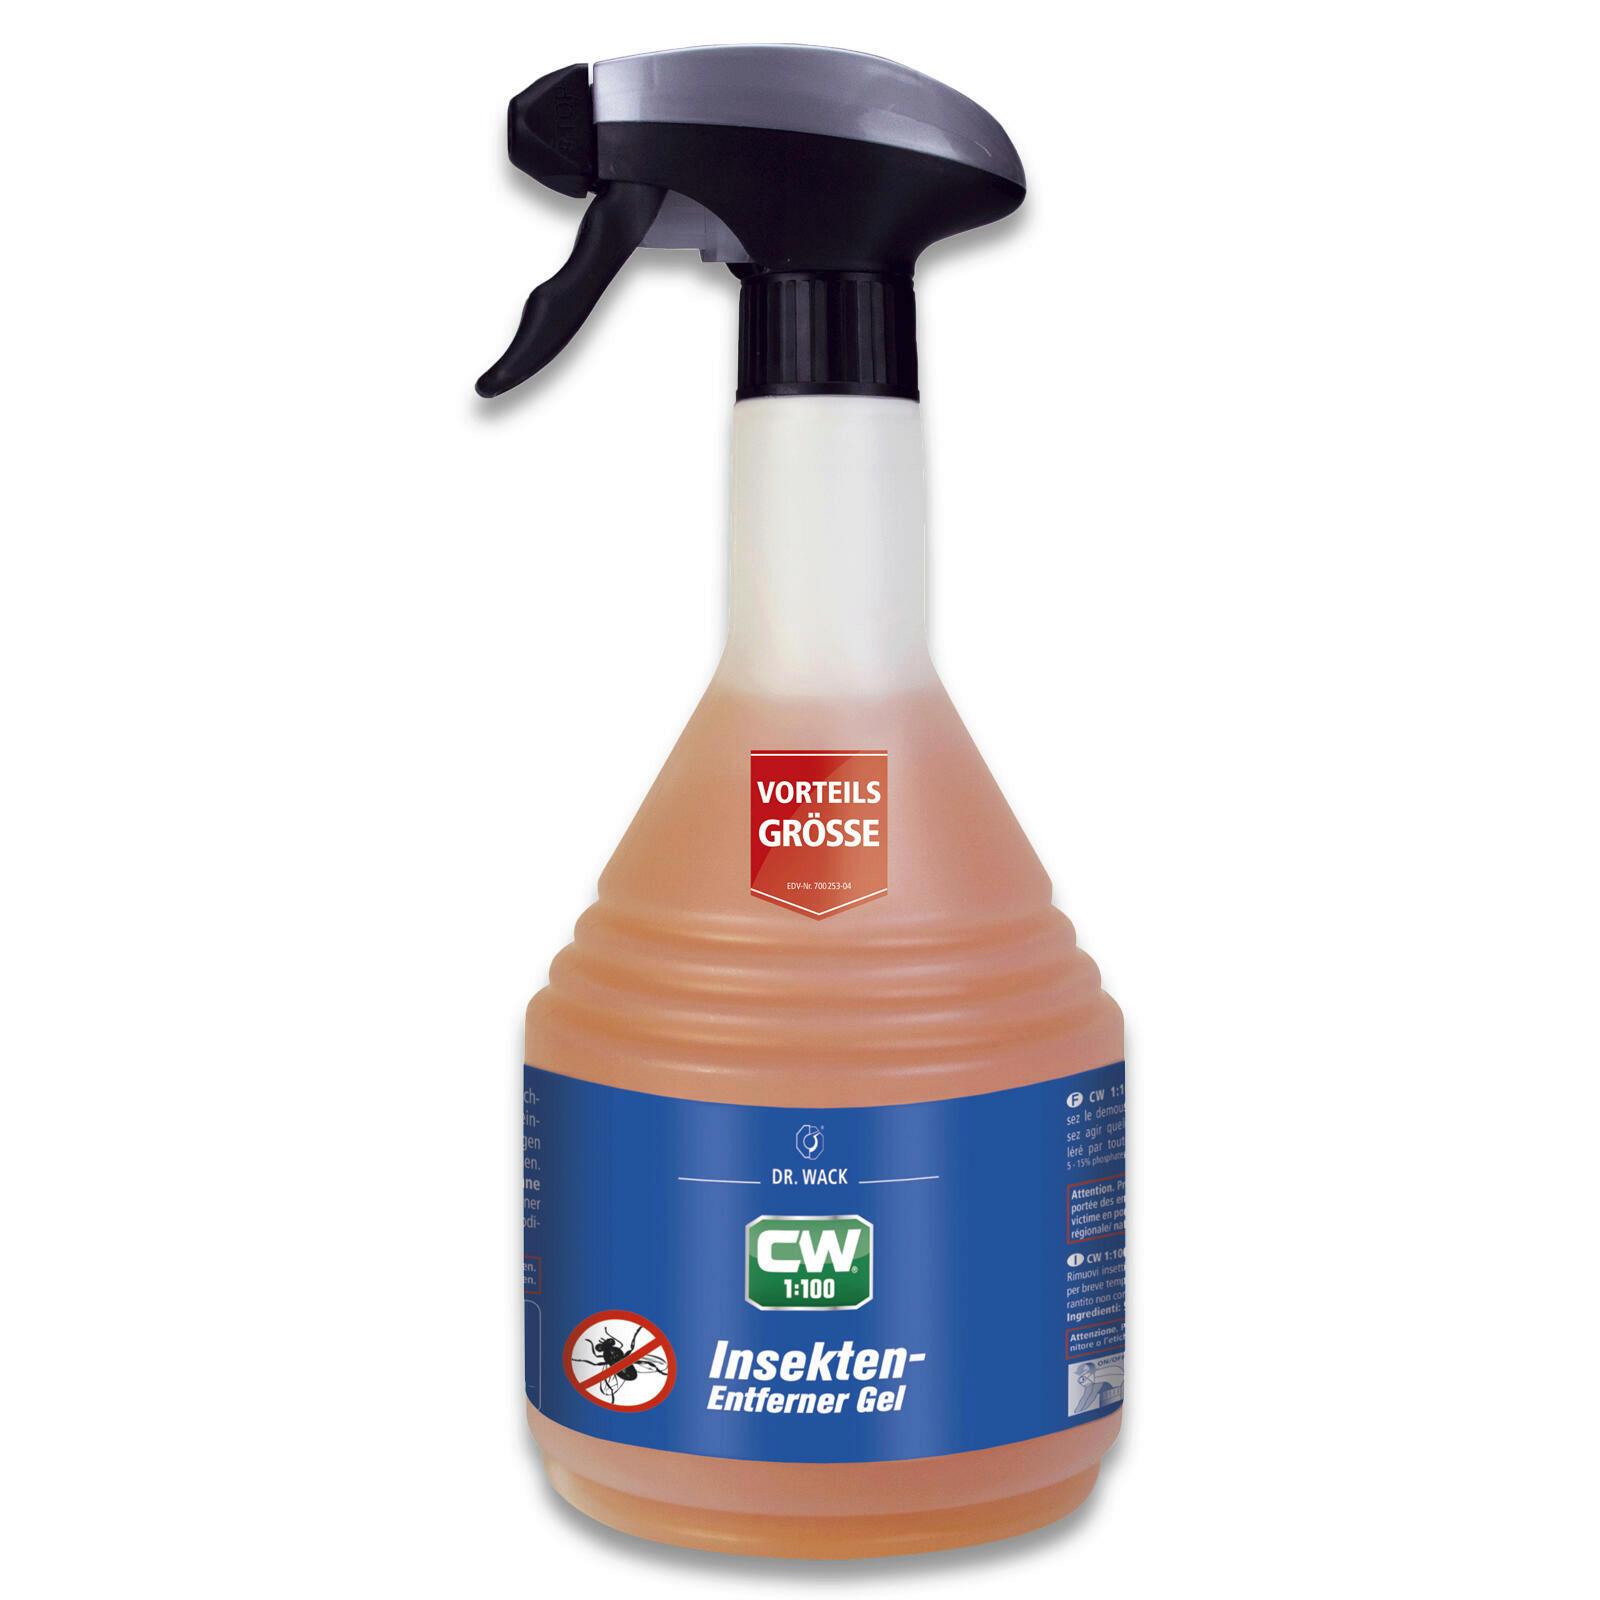 Dr.Wack CW 1:100 Insekten-Entferner-Gel 750ml